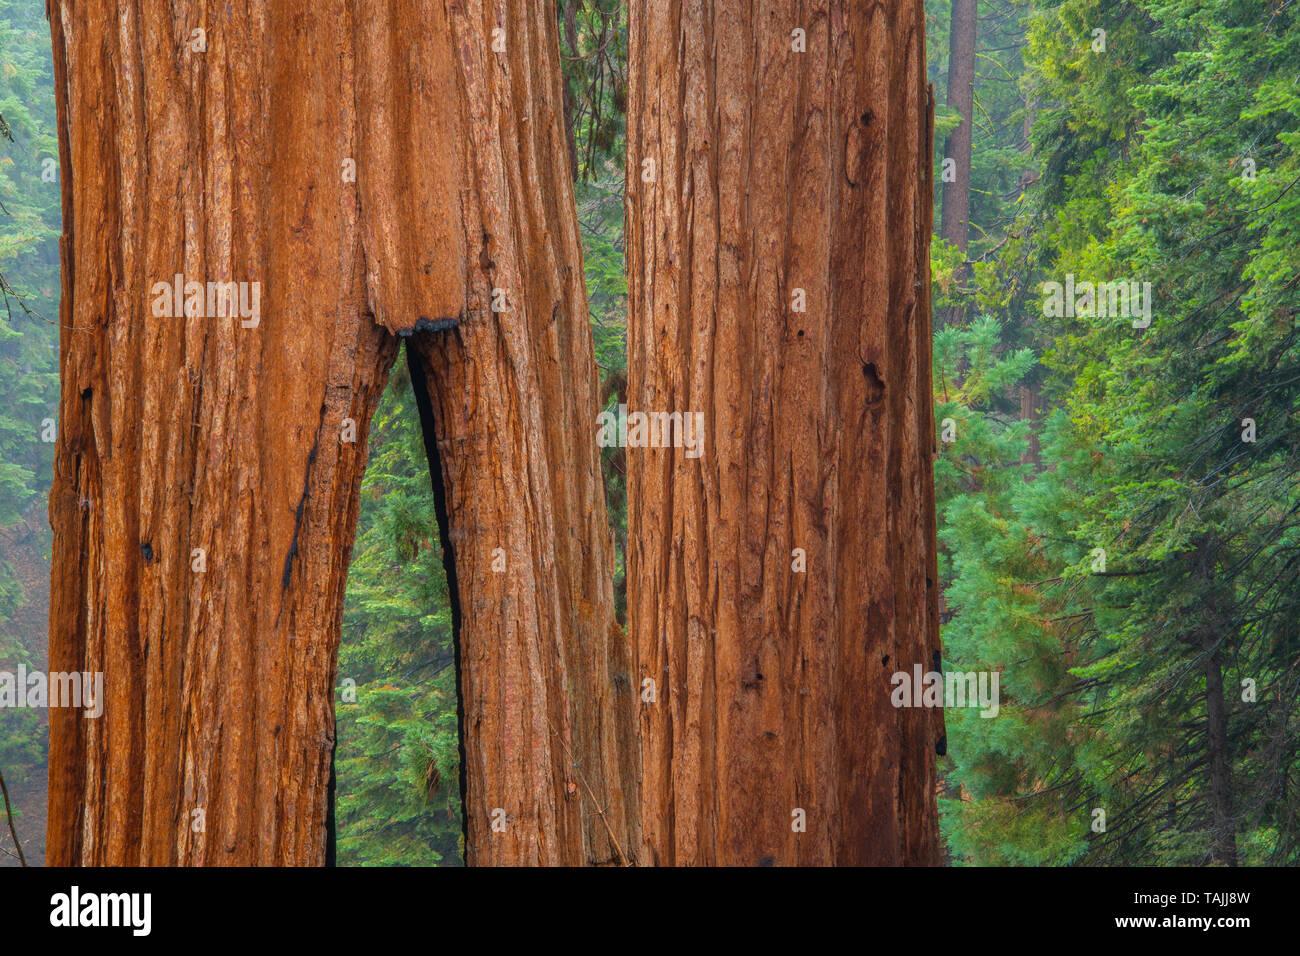 Clothspin tree, Redwood trees (Sequoiadendron giganteum), Mariposa grove, Yosemite NP, California, USA, by Bill Lea/Dembinsky Photo Assoc - Stock Image